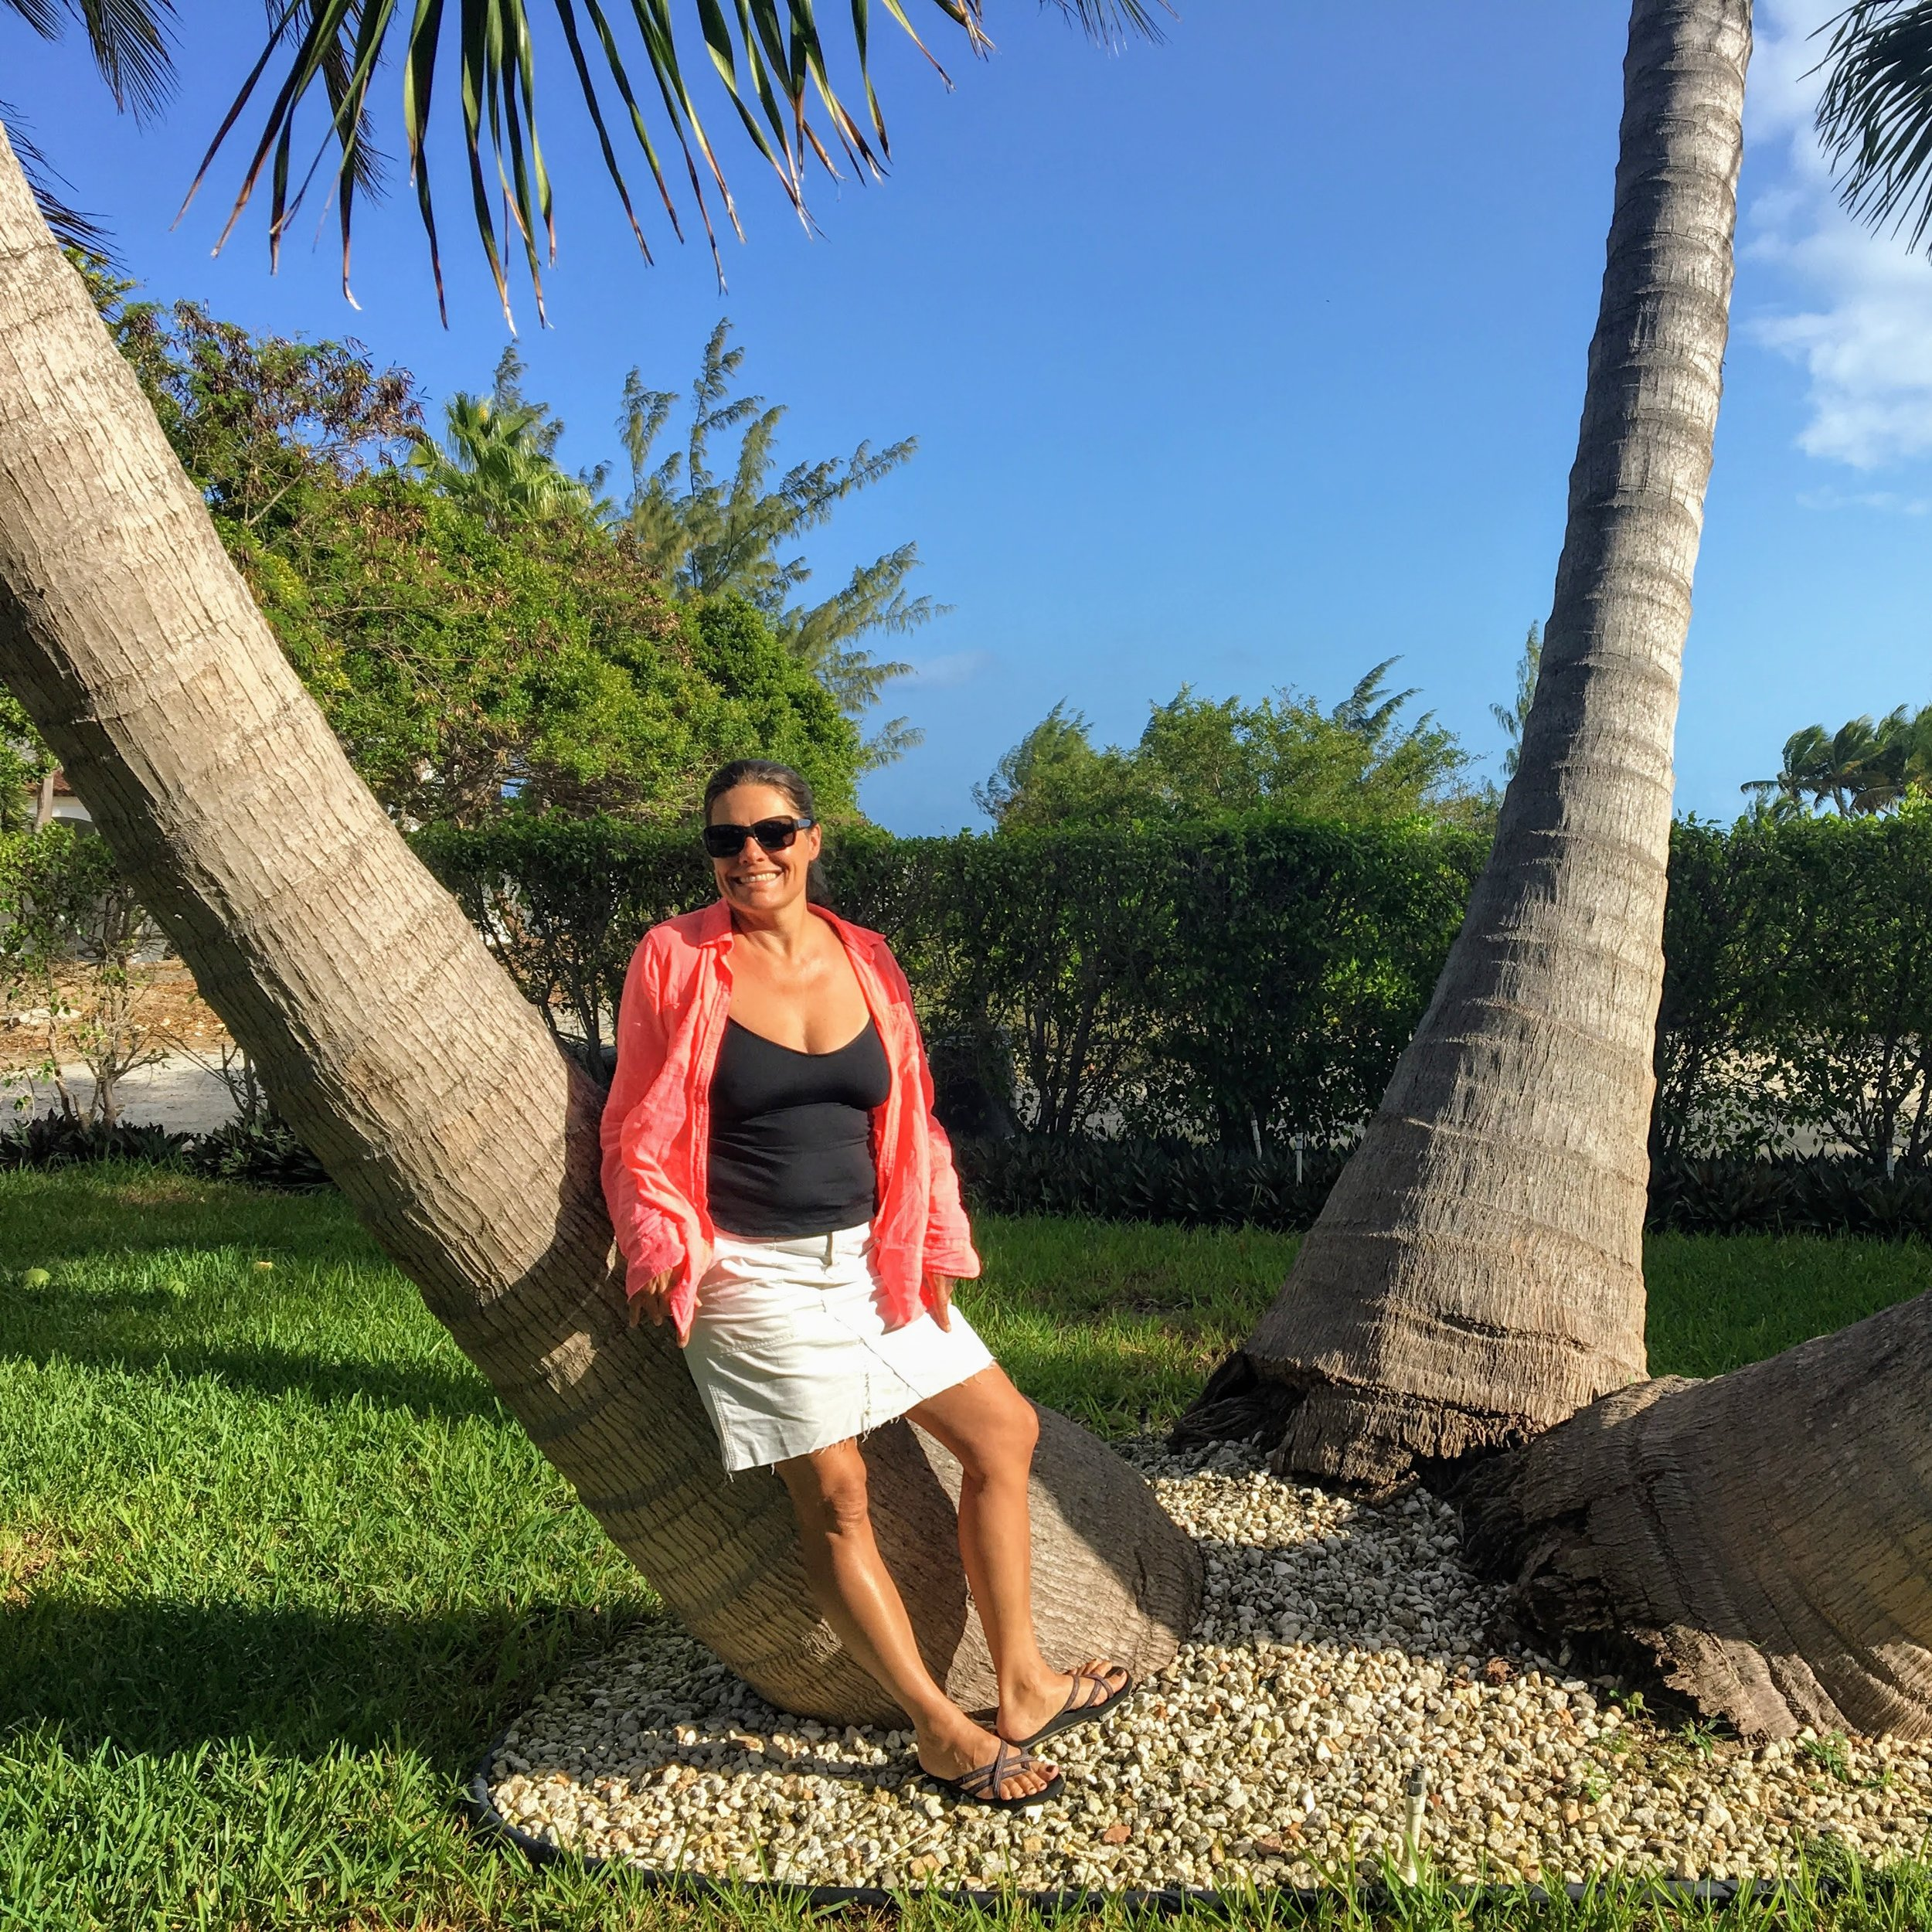 Claudia Williams Turks&Caicos 55by55travel.JPG